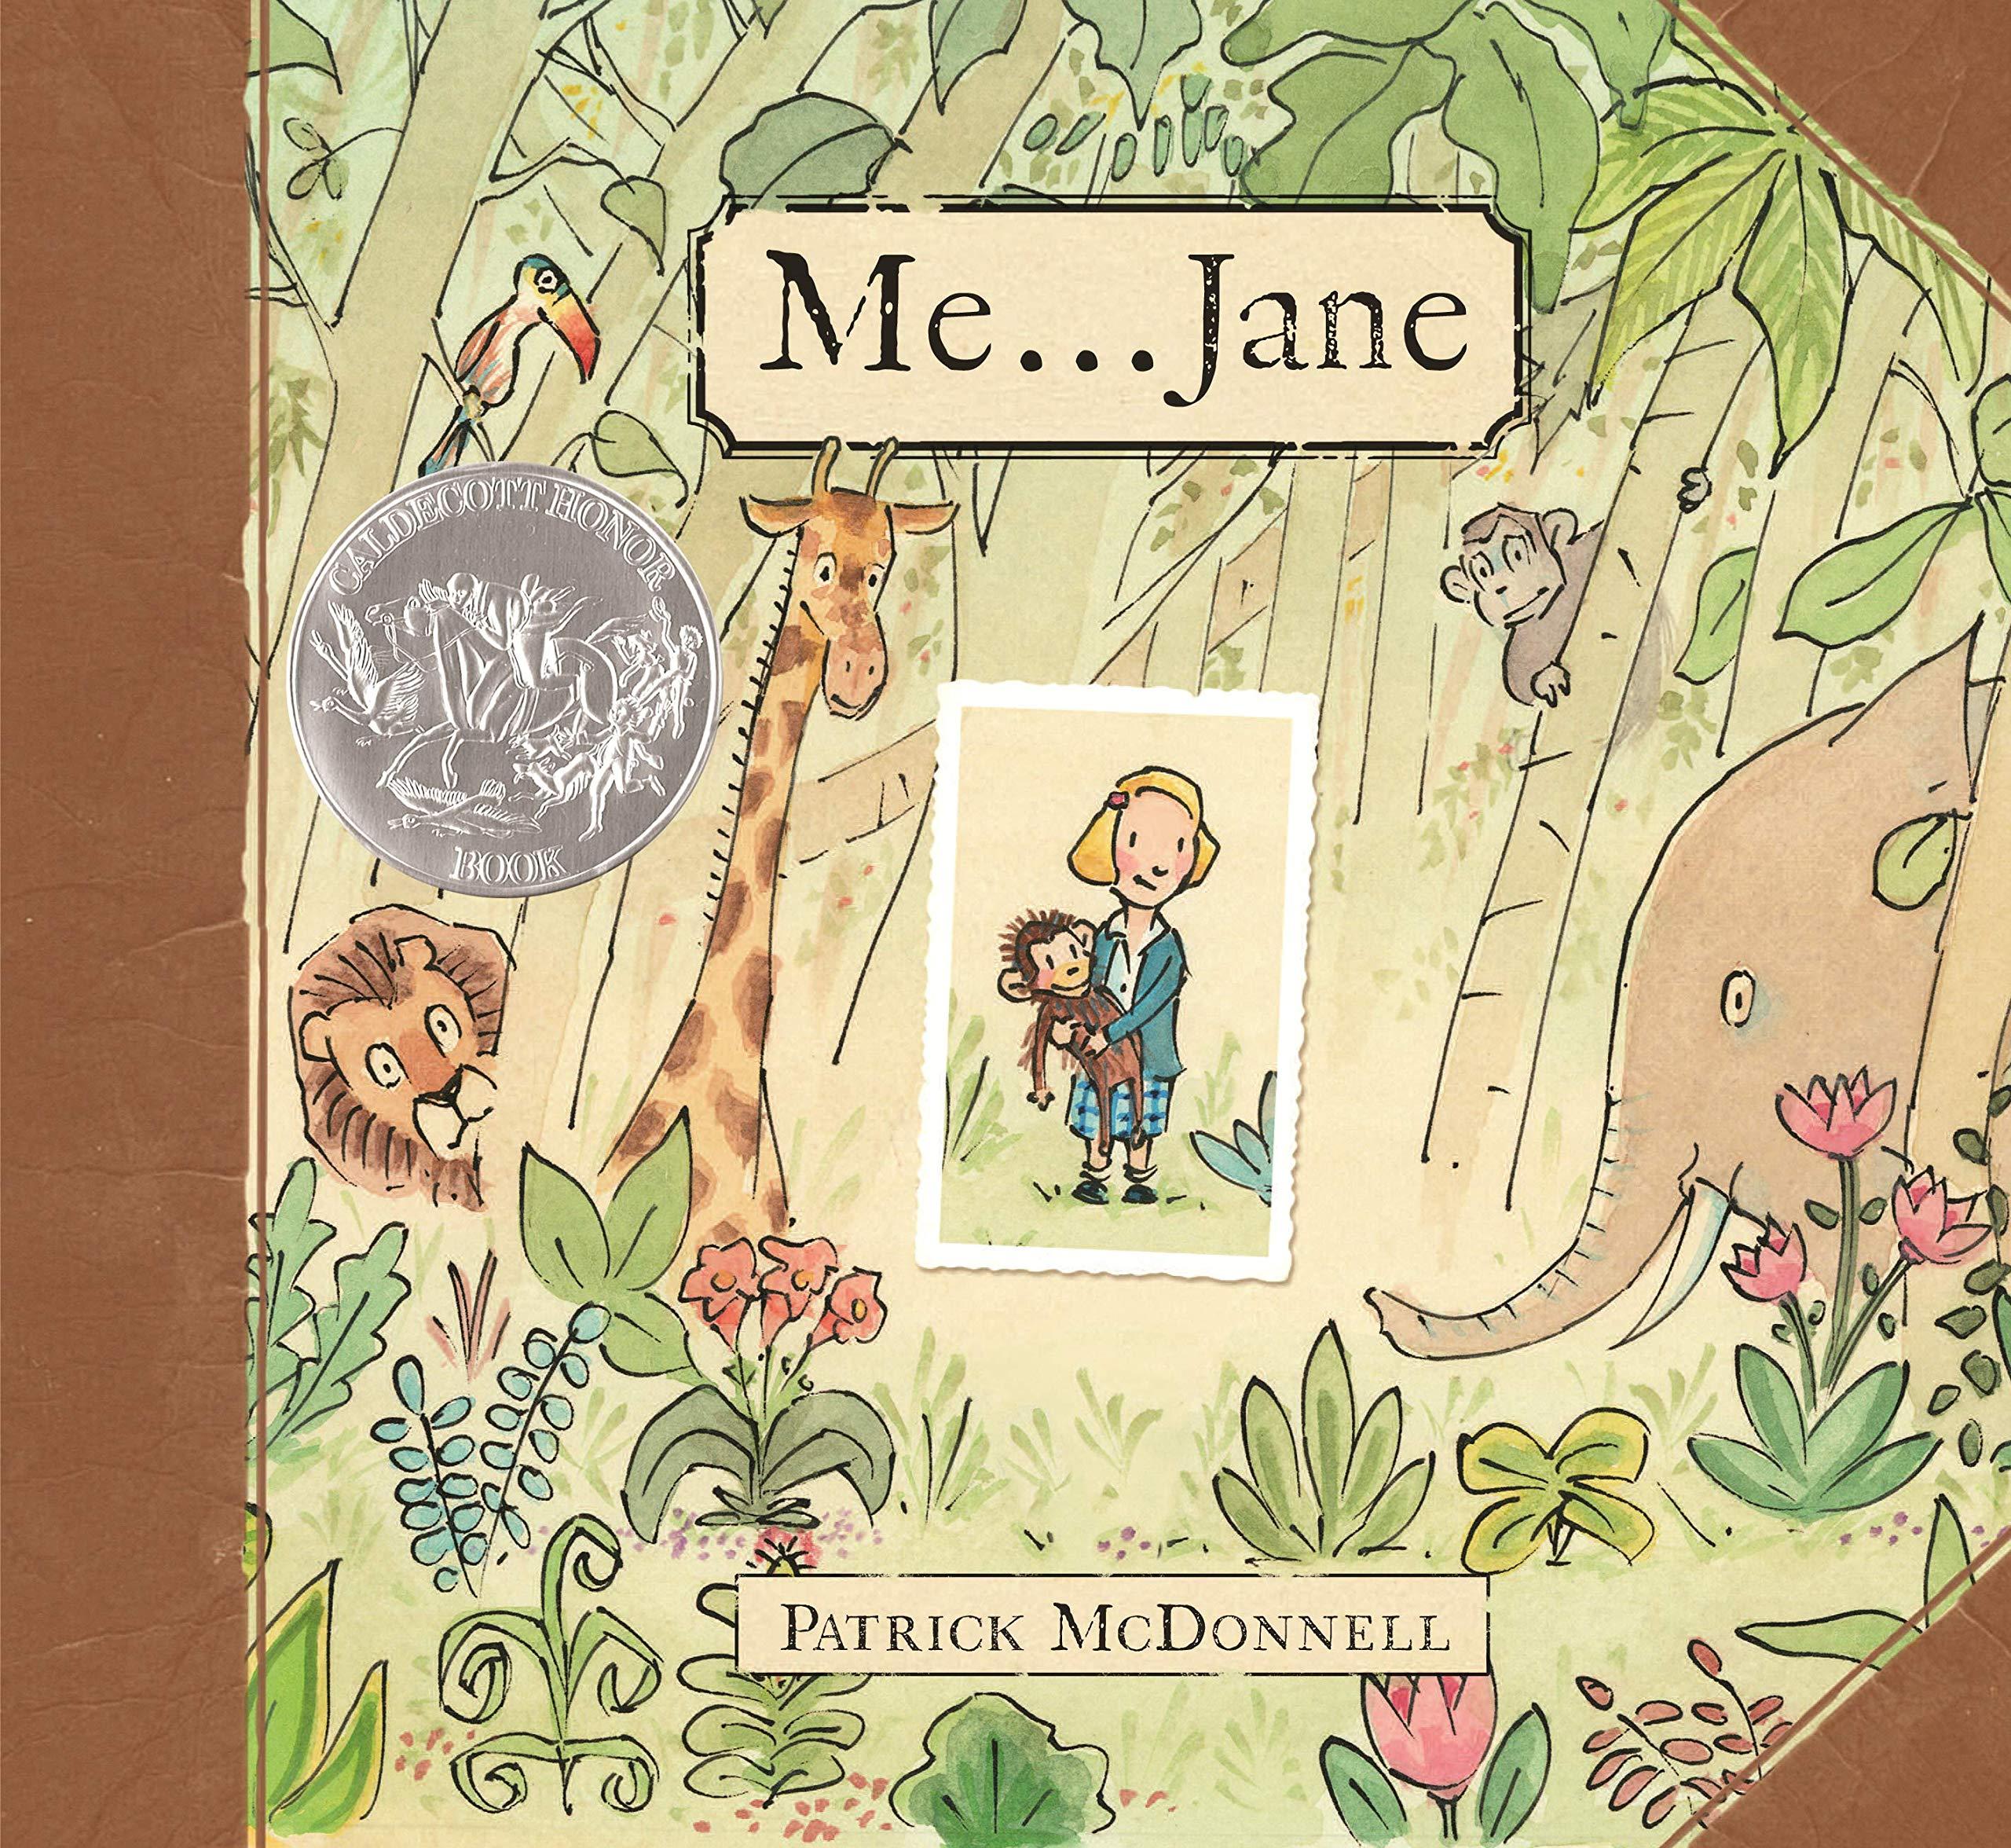 Me...Jane (Mcdonnell Patrick)